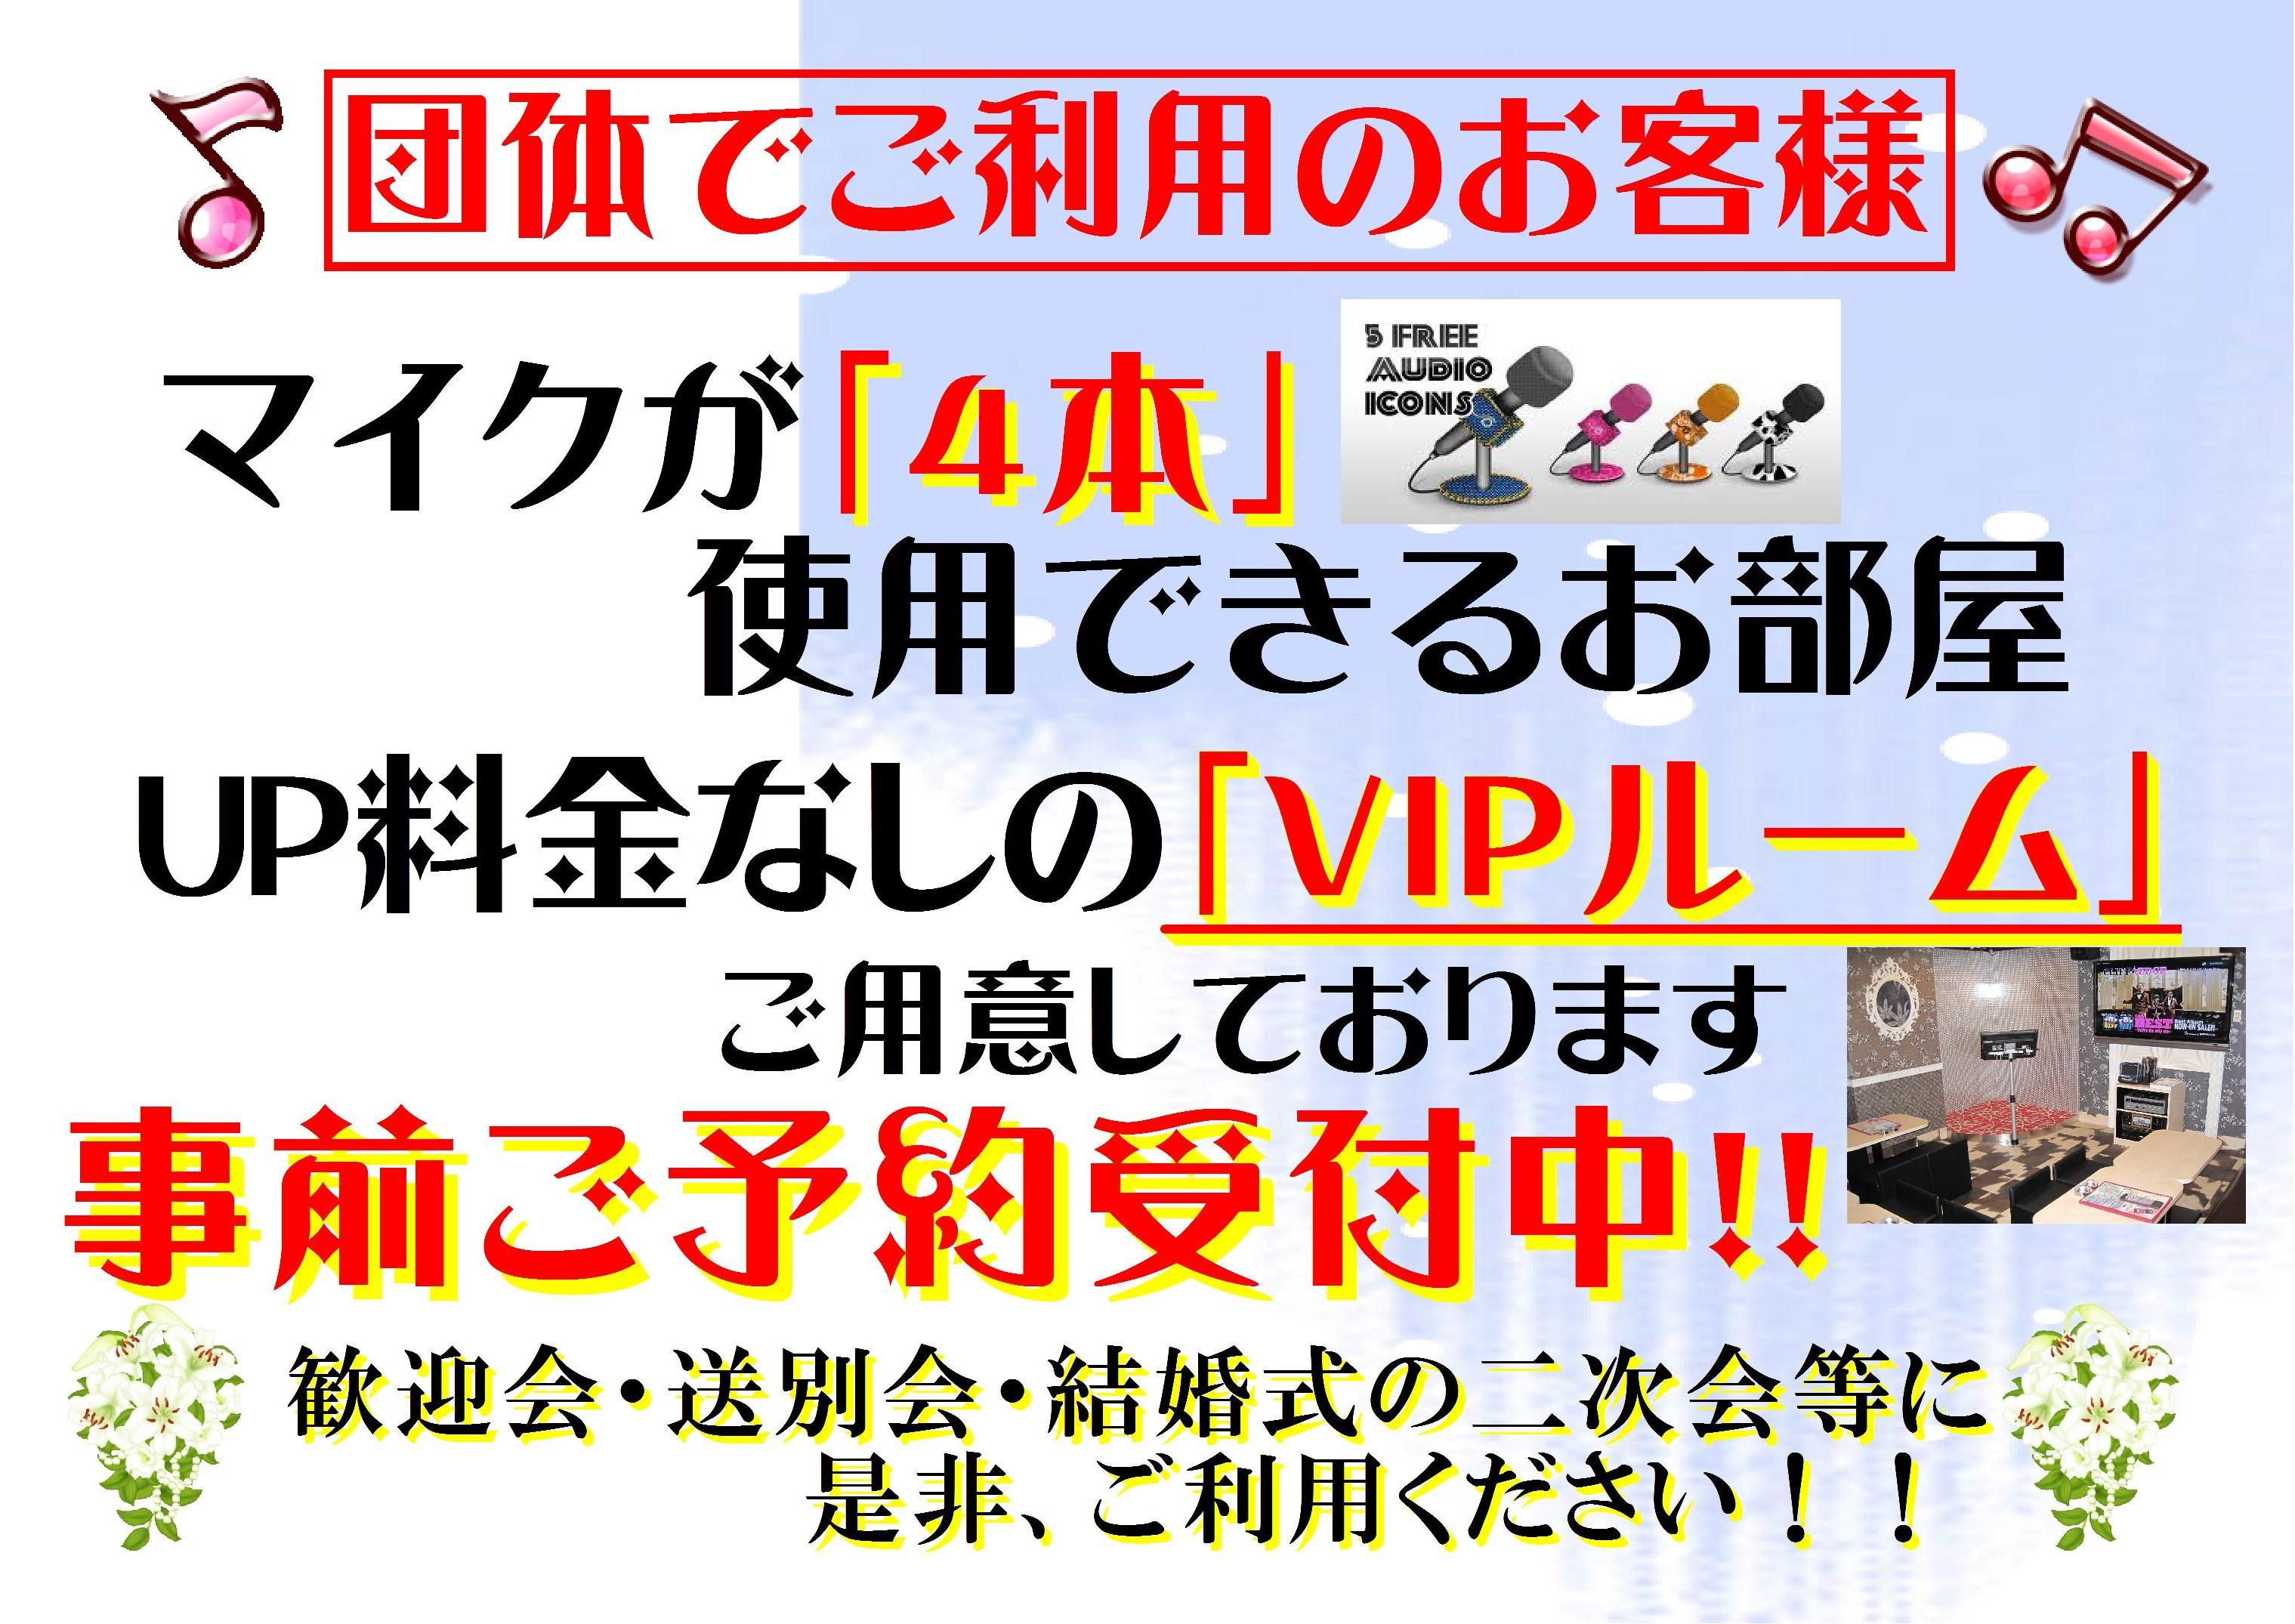 H26年2月 近江八幡 ≪ 定型紙(B5) ≫